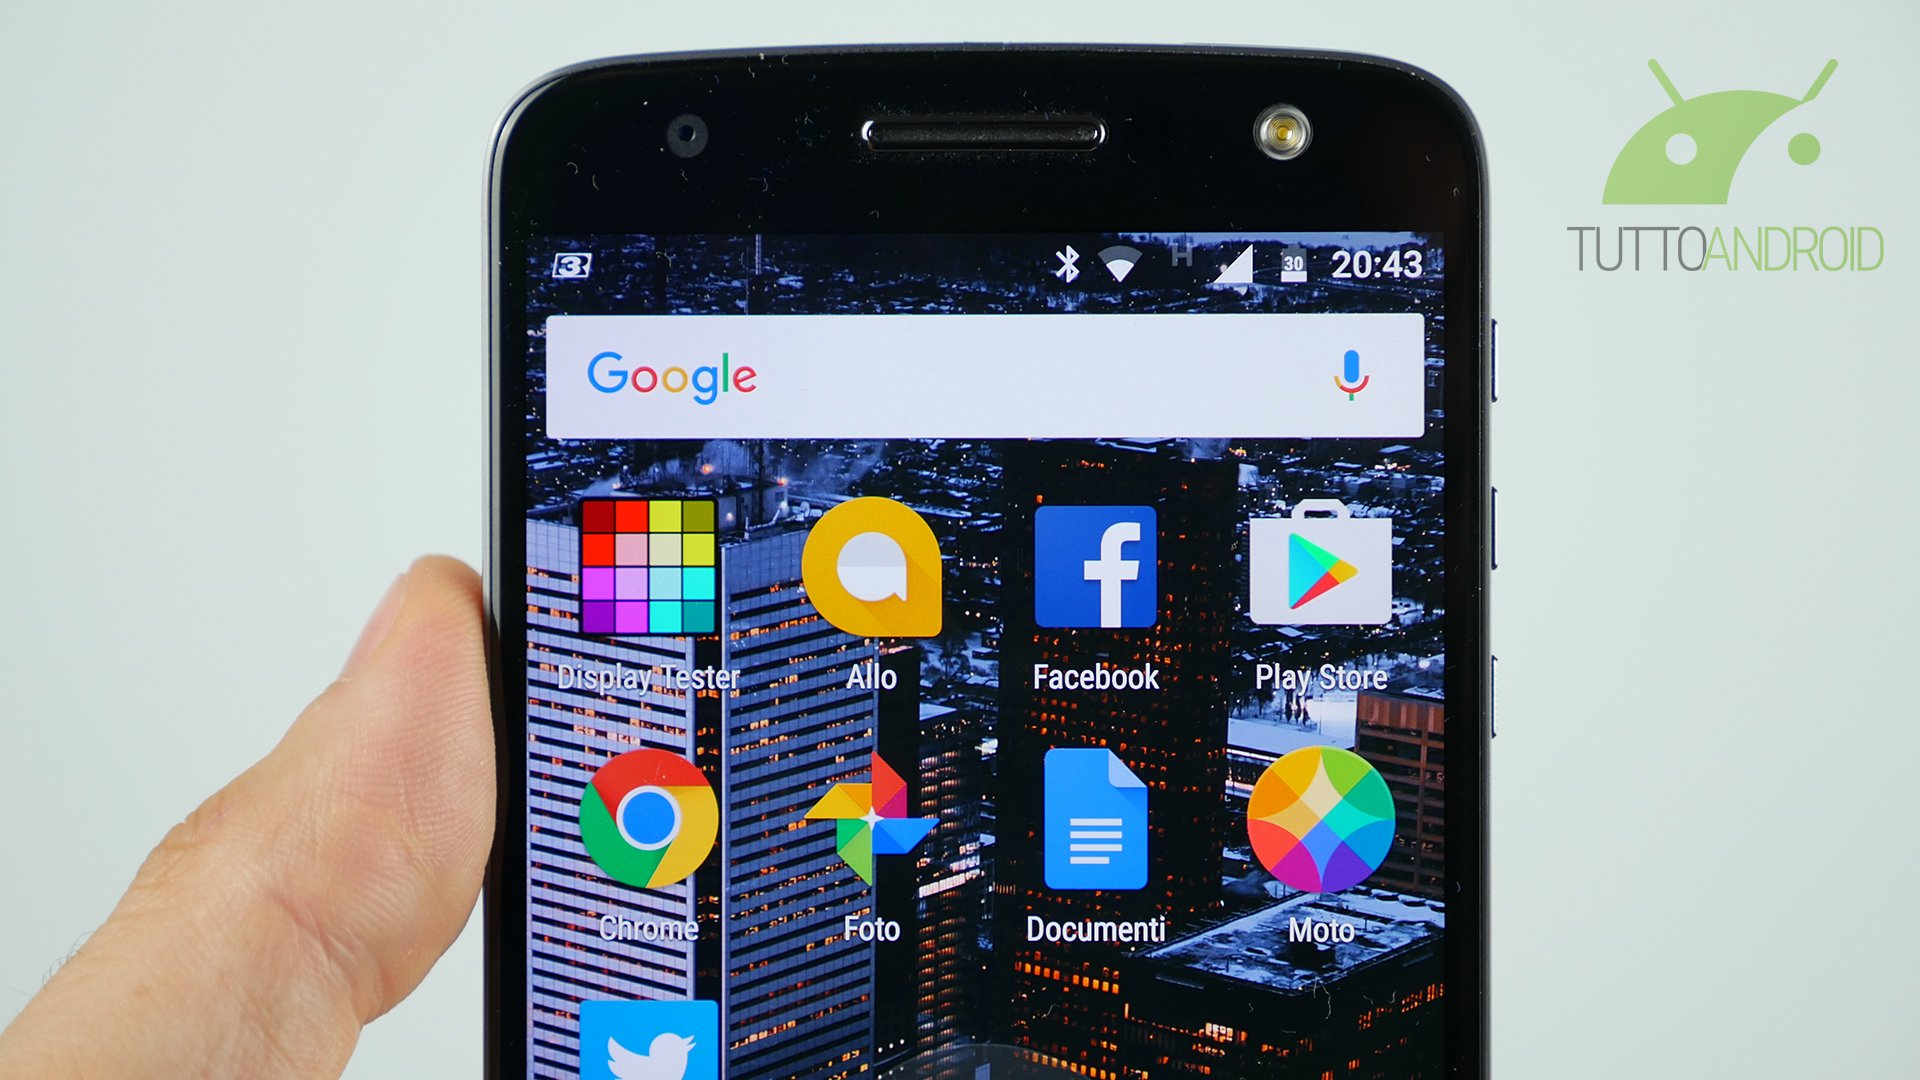 Lenovo annuncia Android 7.0 Nougat per Moto Z e Moto Z Force